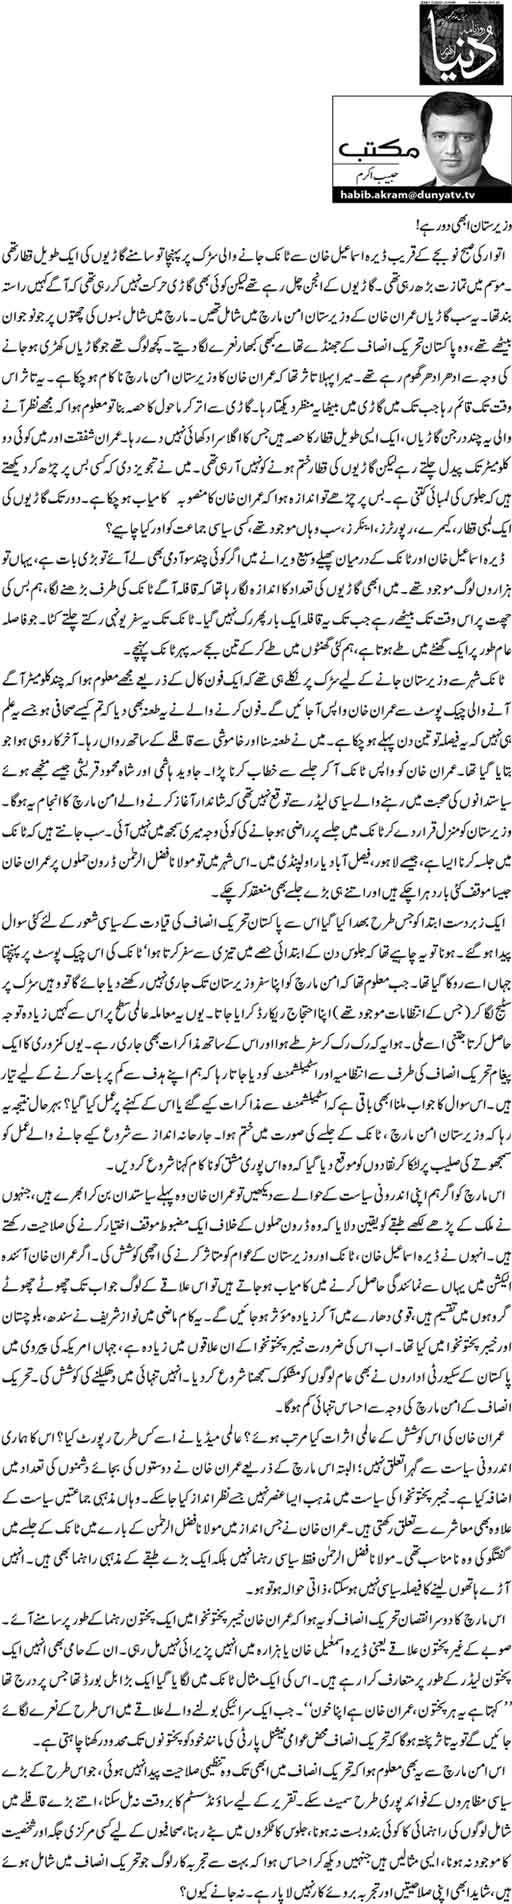 Waziristan abhi door hai! - Habib Akram